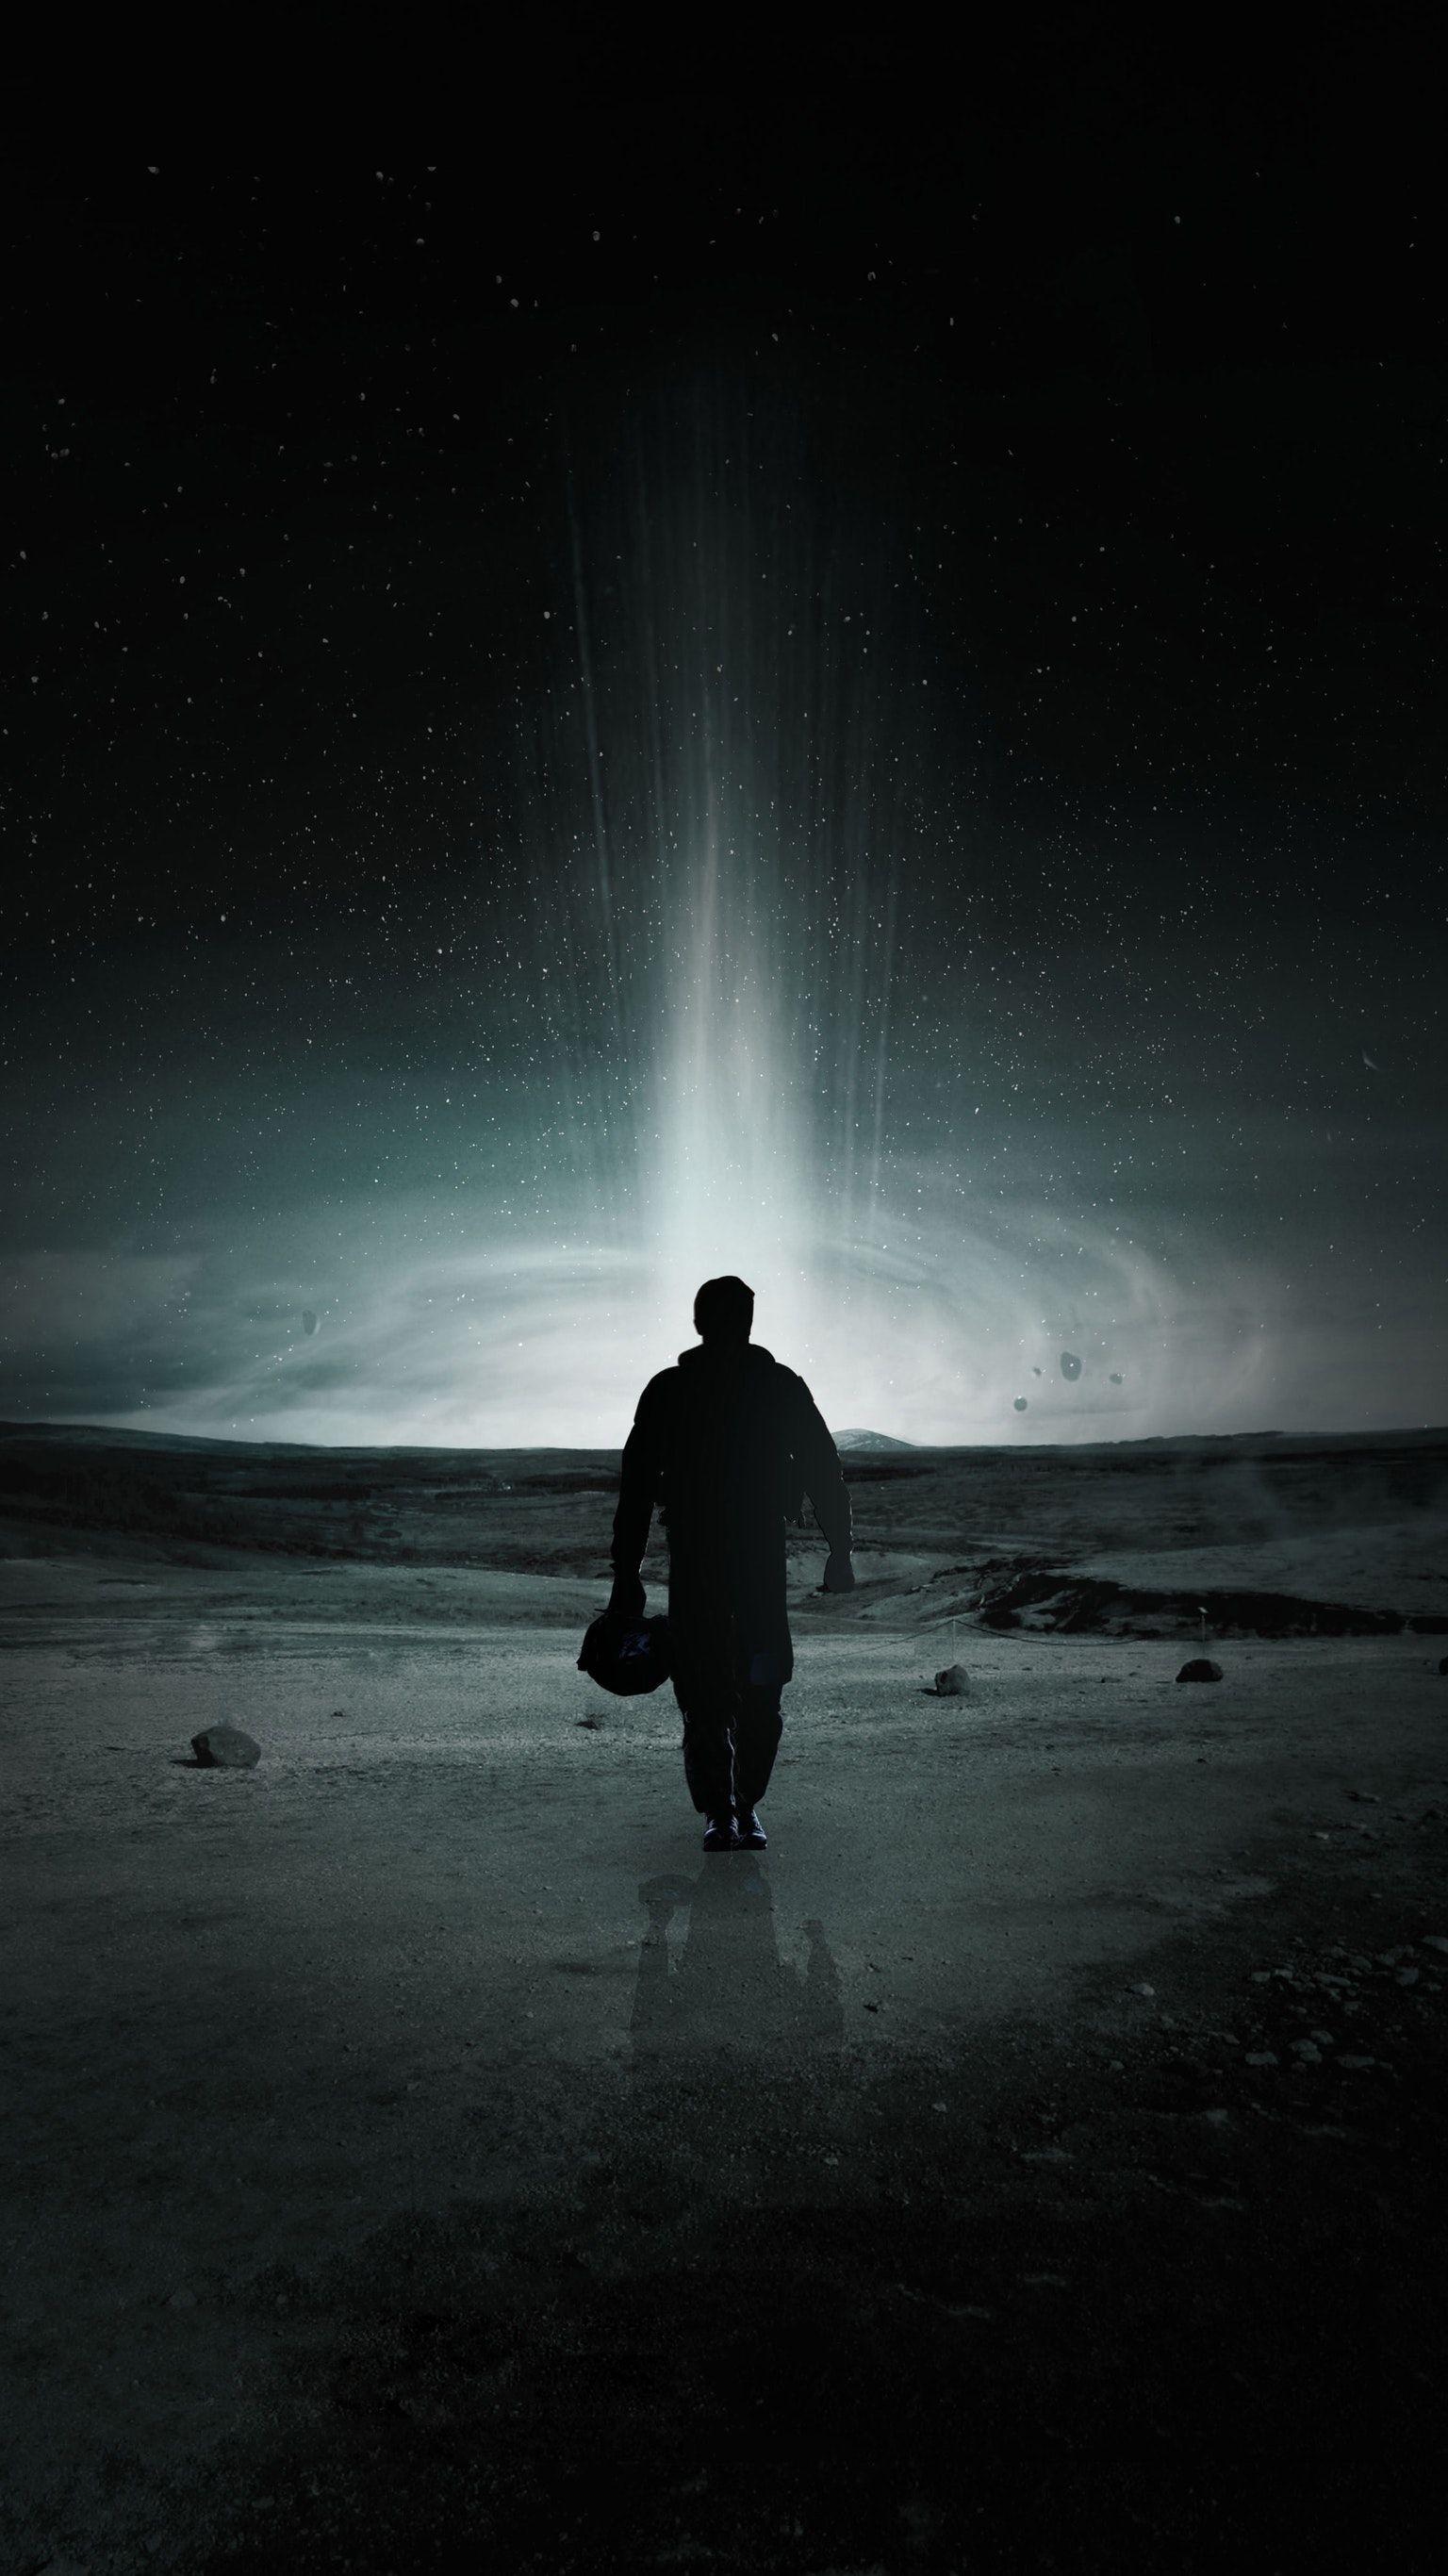 Interstellar 2014 Phone Wallpaper Moviemania Interstellar Movie Interstellar Space Movies